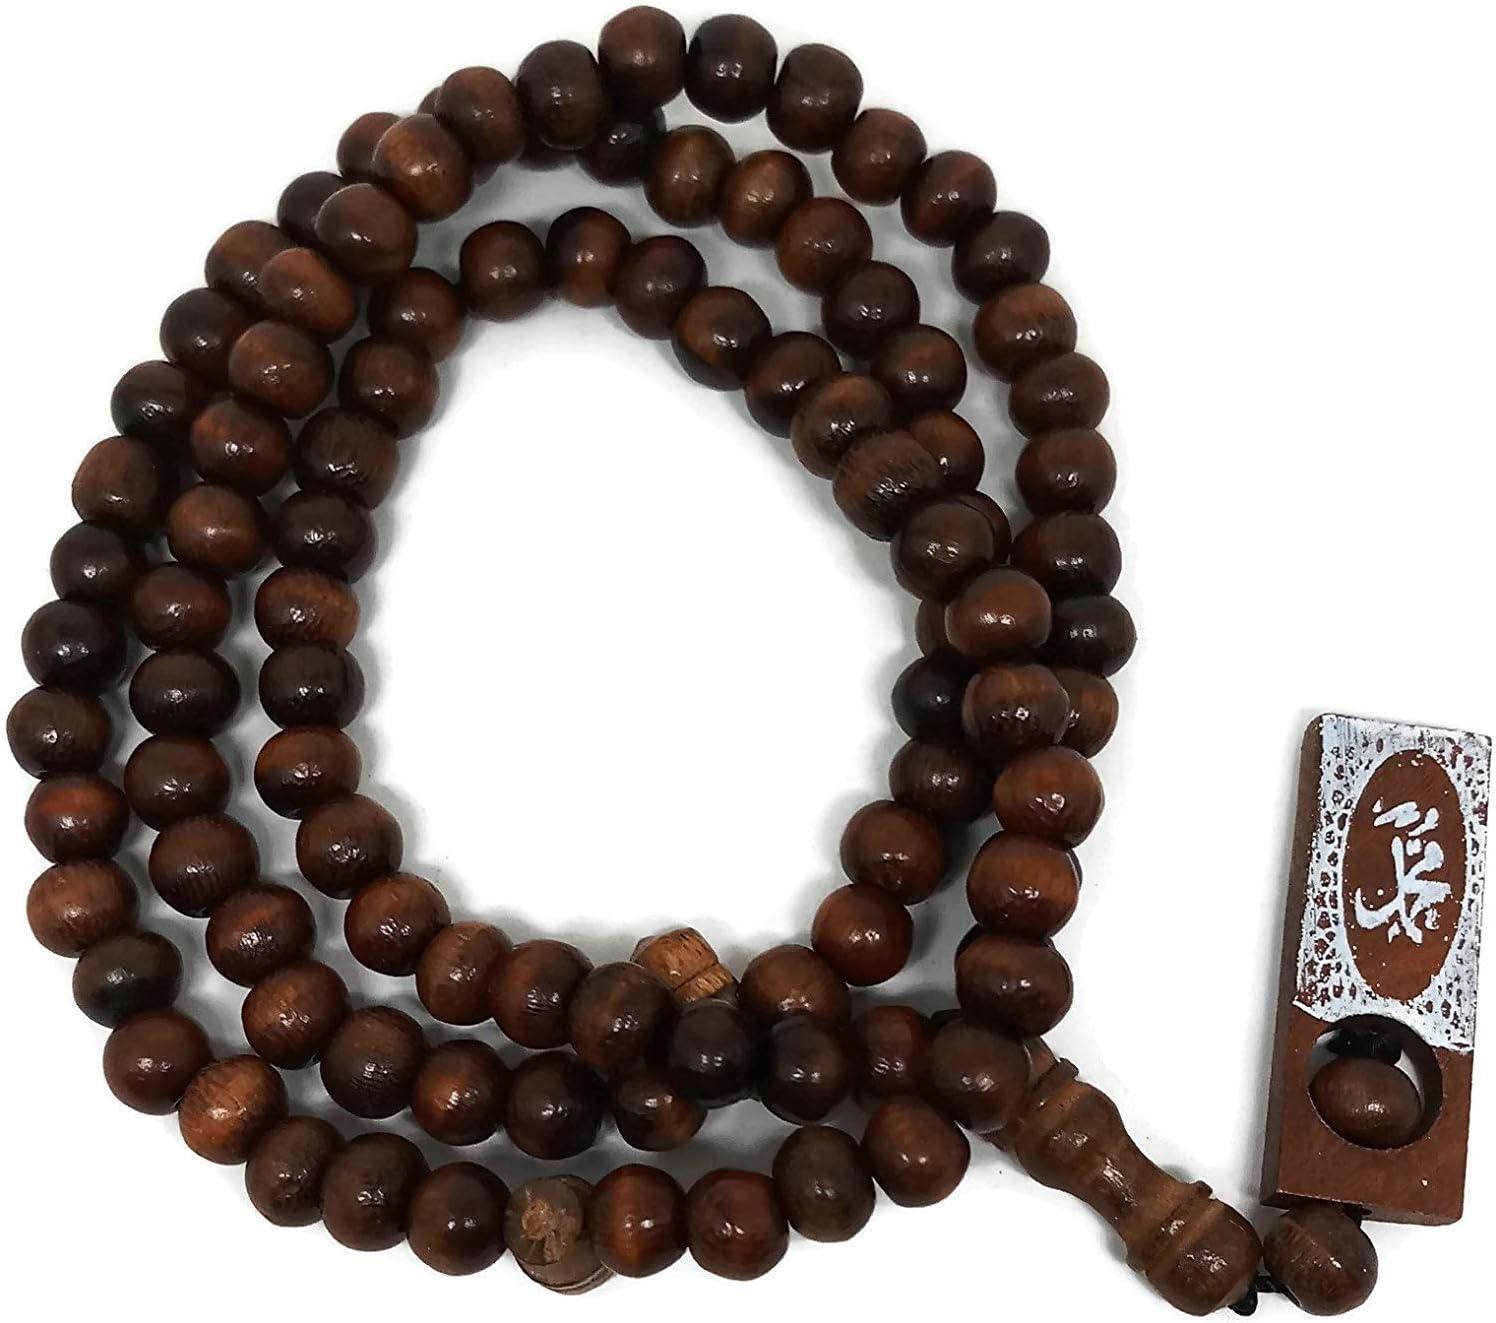 Dark Brown Muslim Wooden Tasbih 99 Rosary Beads Amn081 Printed Picture Tag Islam Prayer Zikr Misbaha Ramadan Gift